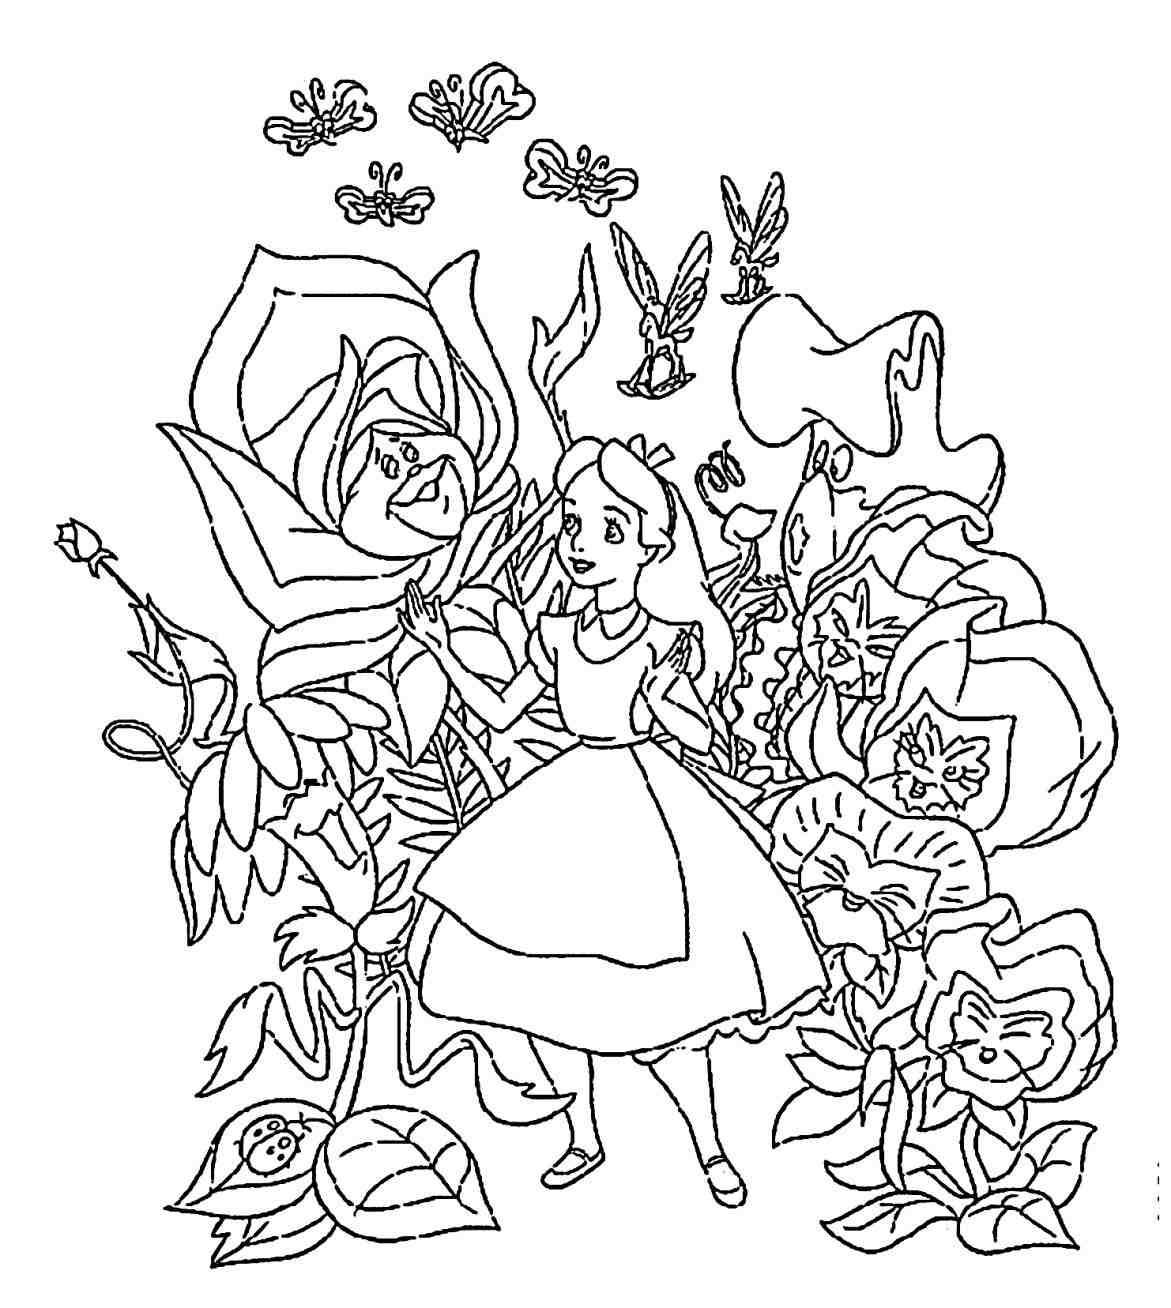 1171x1308 How To Draw Alice In Wonderland Caterpillar